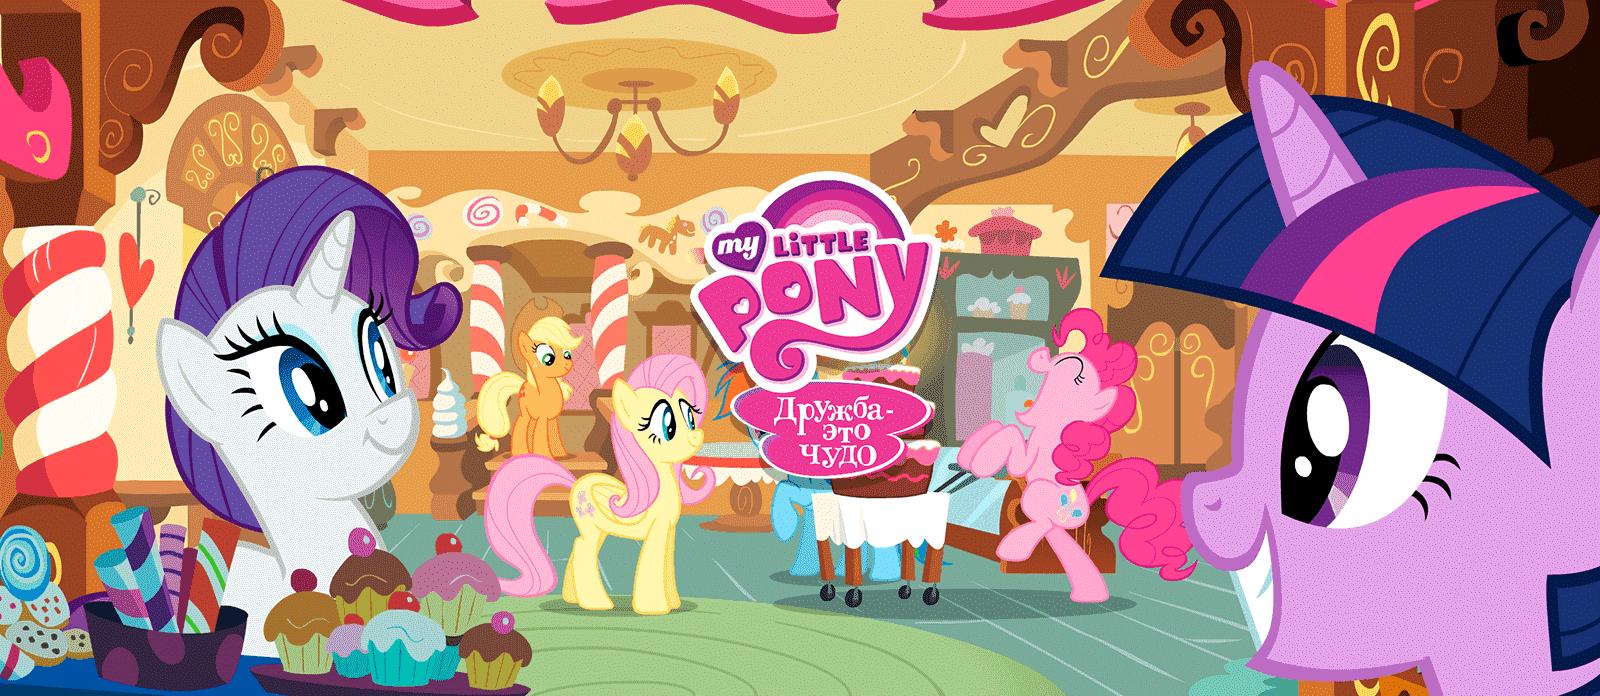 Hasbro My Little Pony E1973/E2585 Май Литл Пони Разговор о дружбе Твайлайт Спаркл